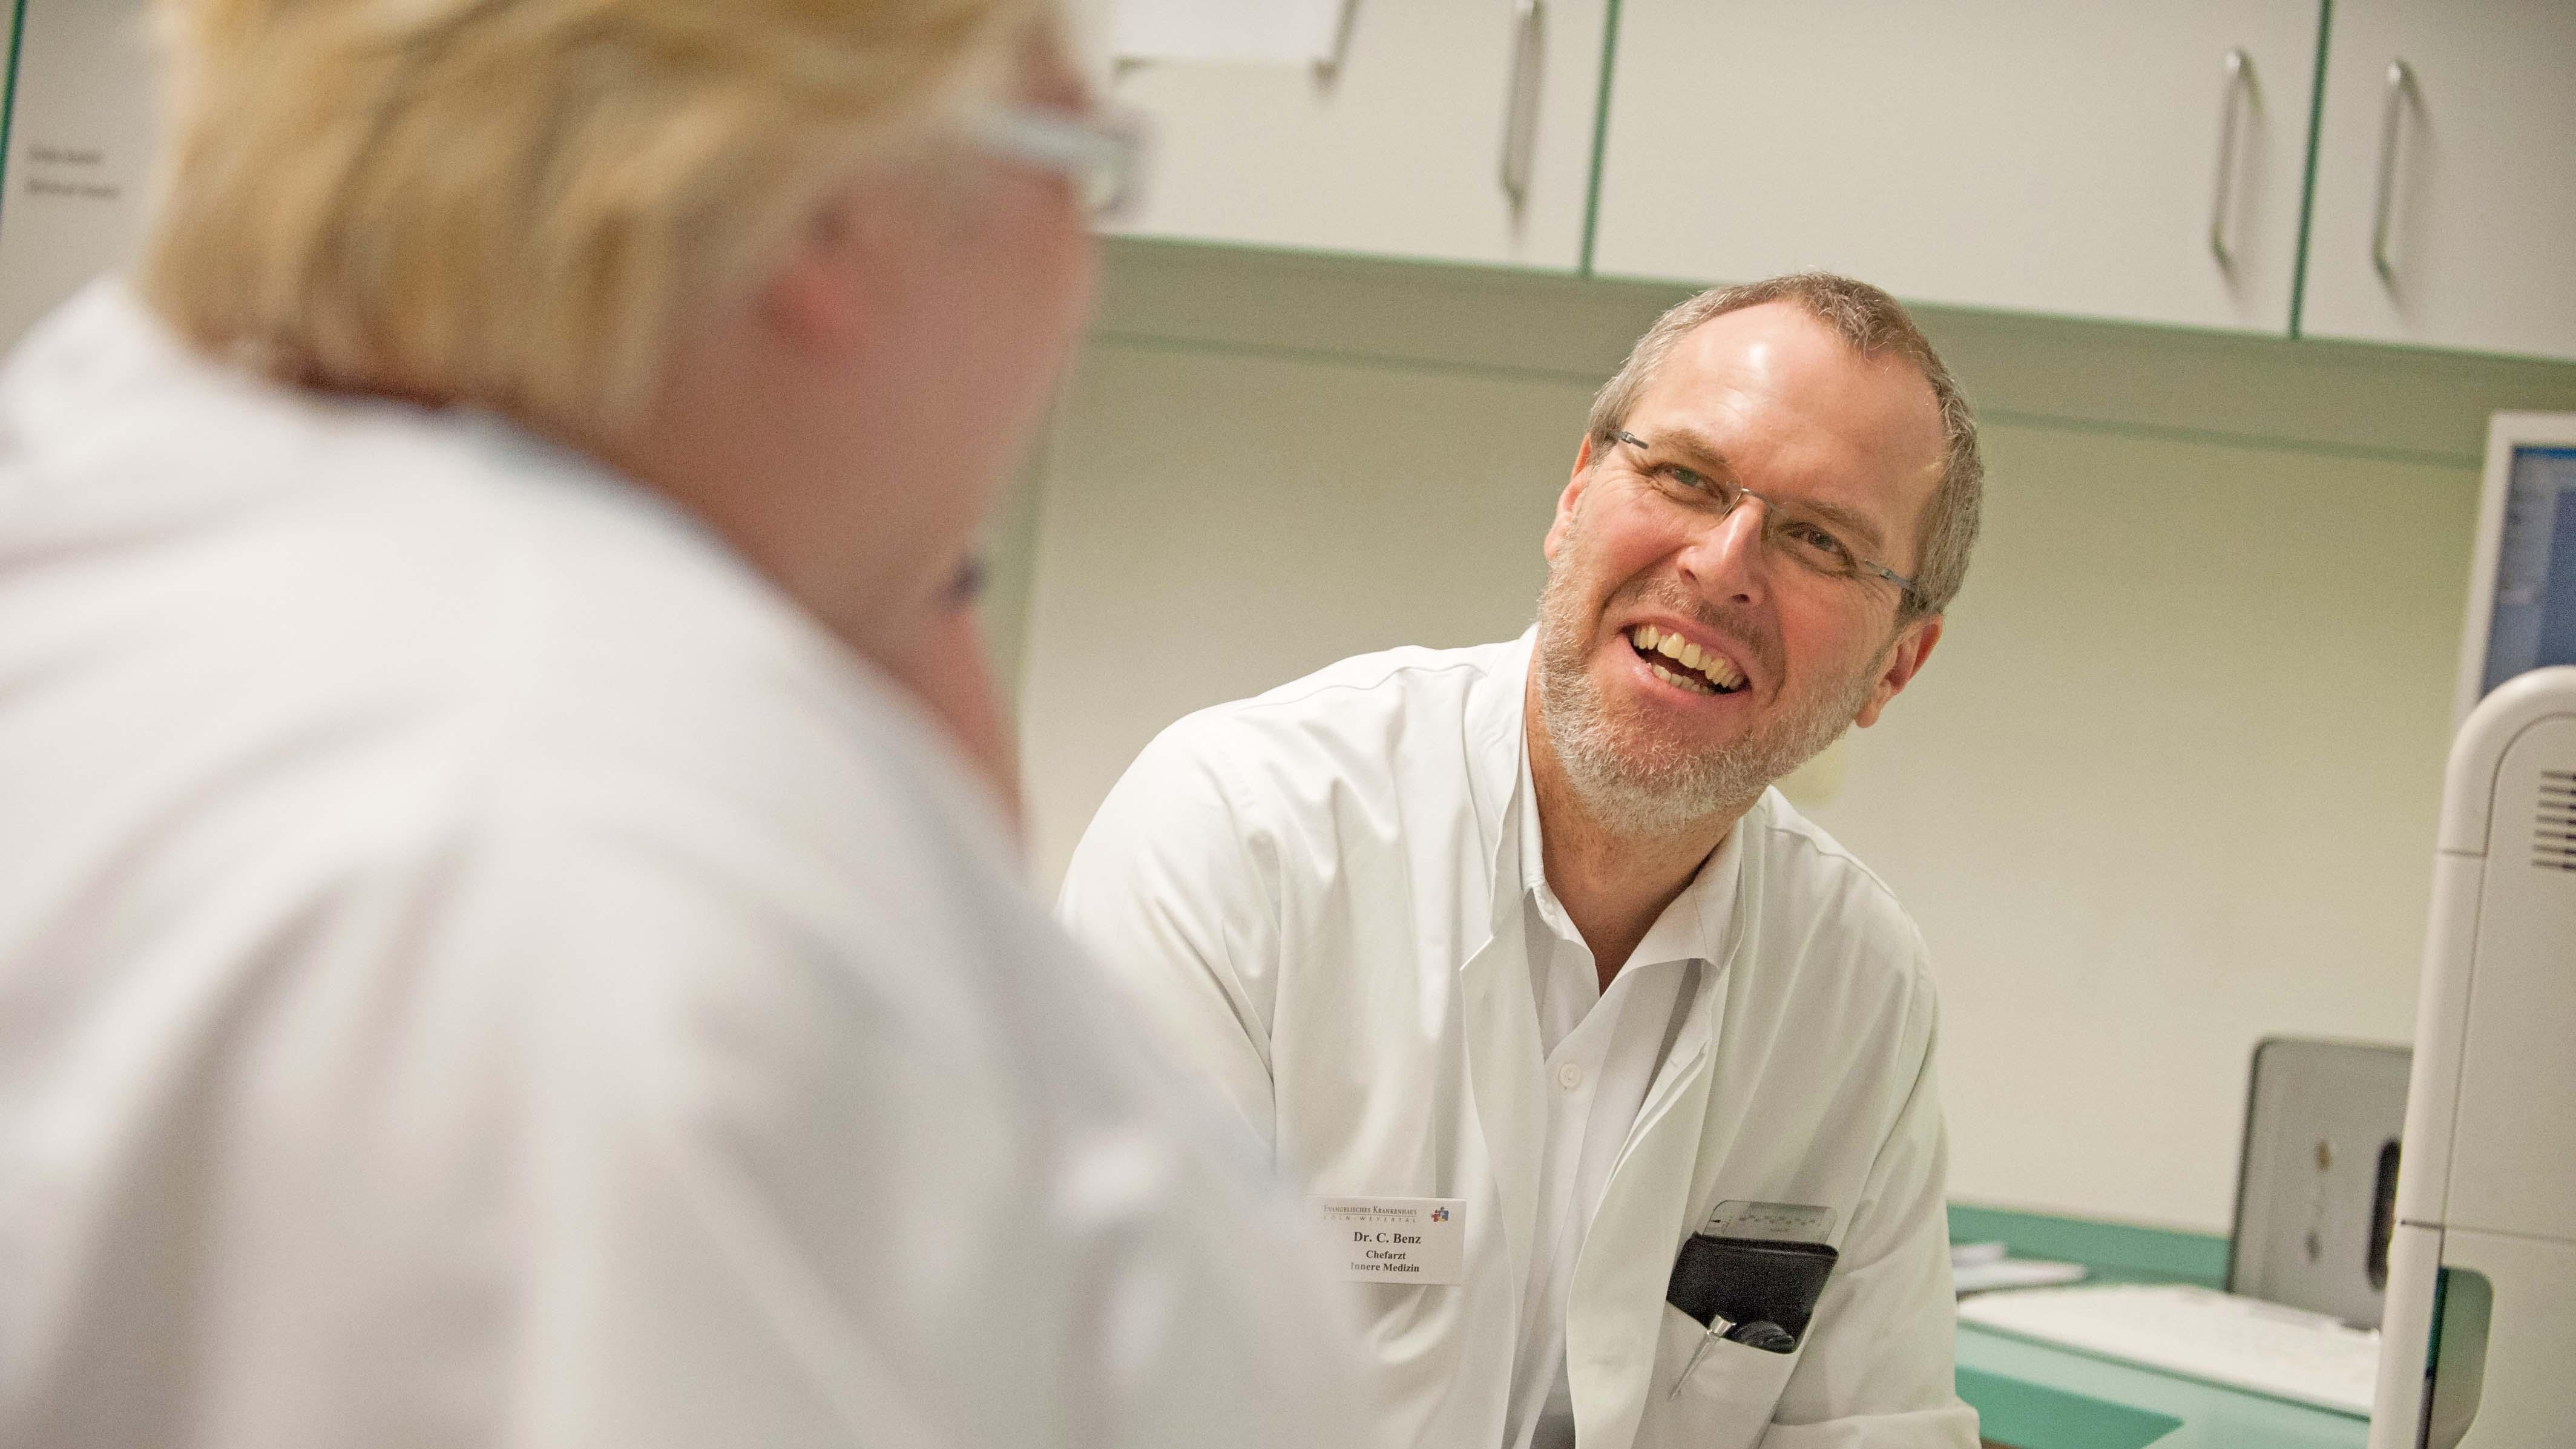 Chefarzt Dr. Claus Benz